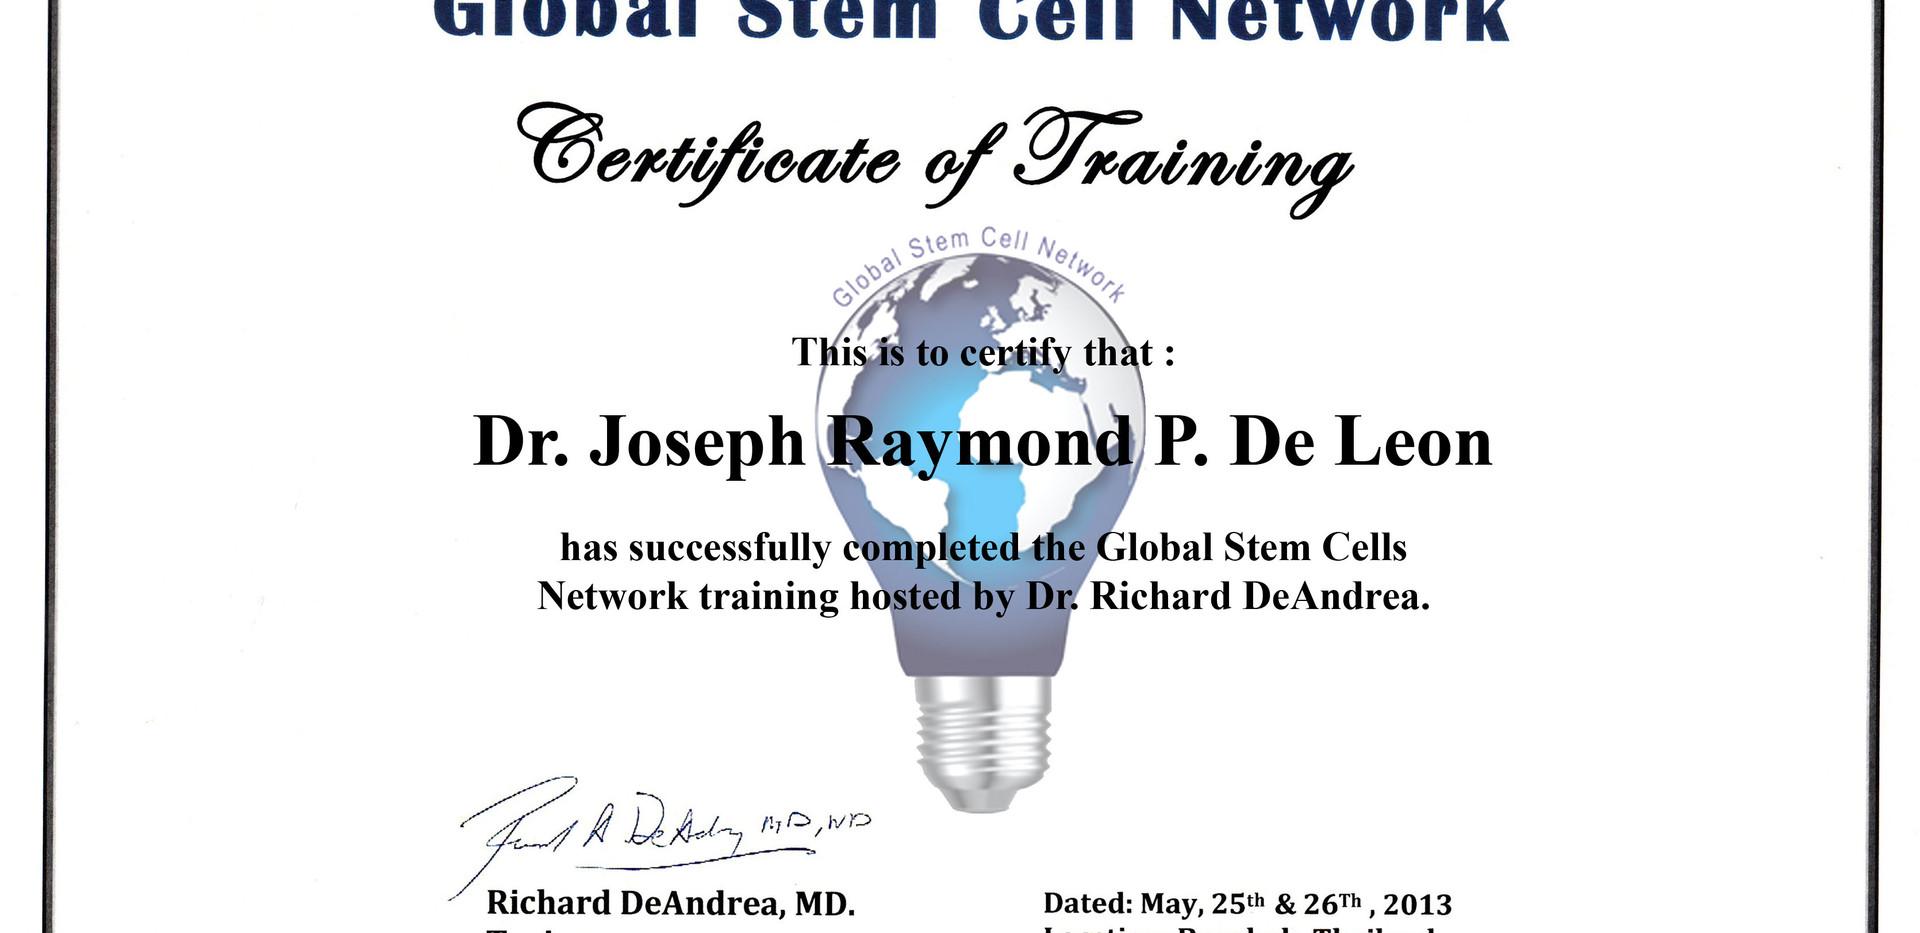 Global Stem Cell Network